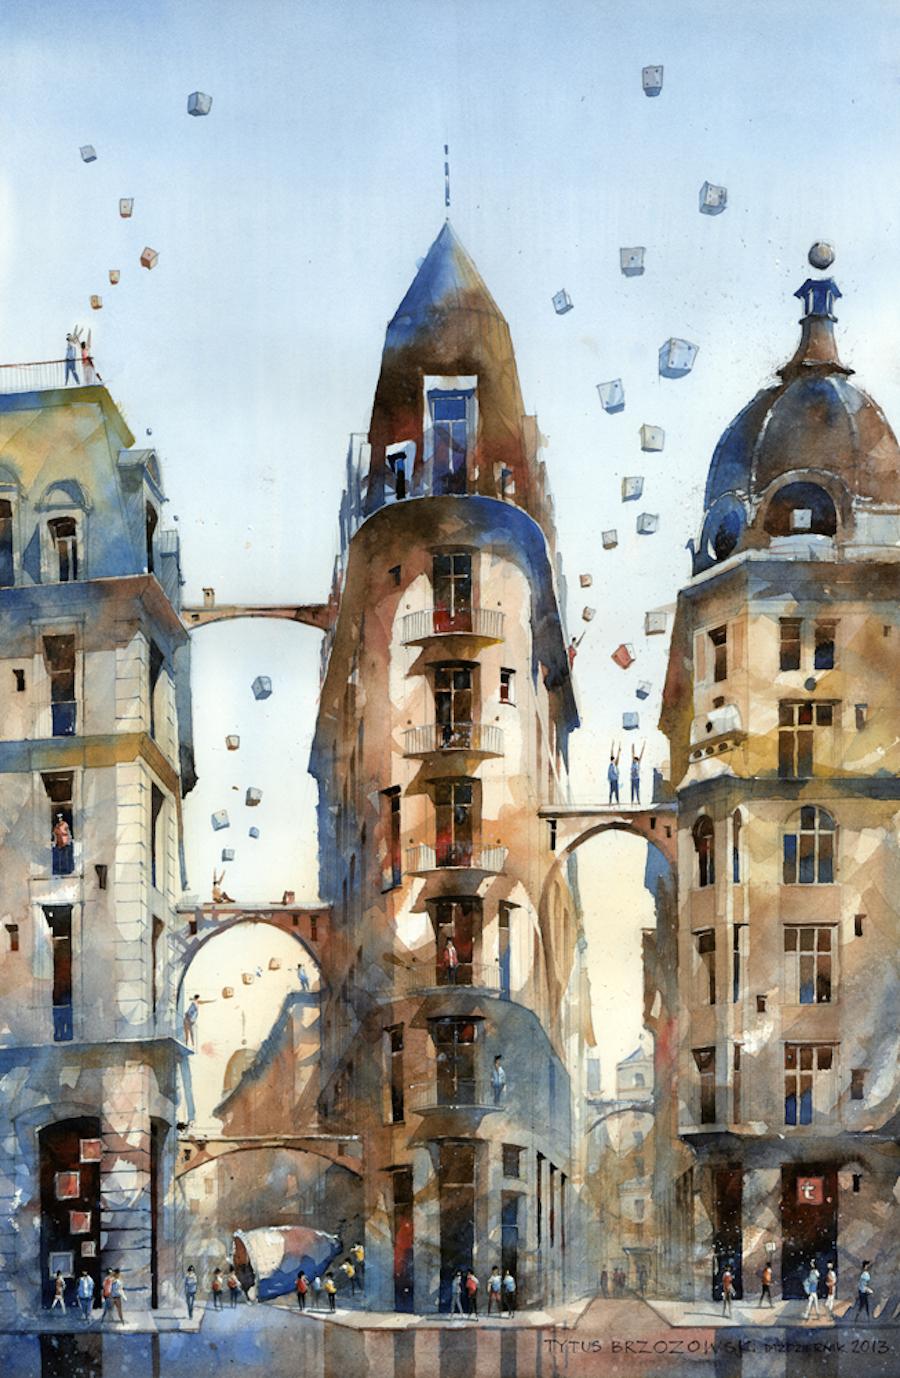 Artist Spotlight: Tytus Brzozowski